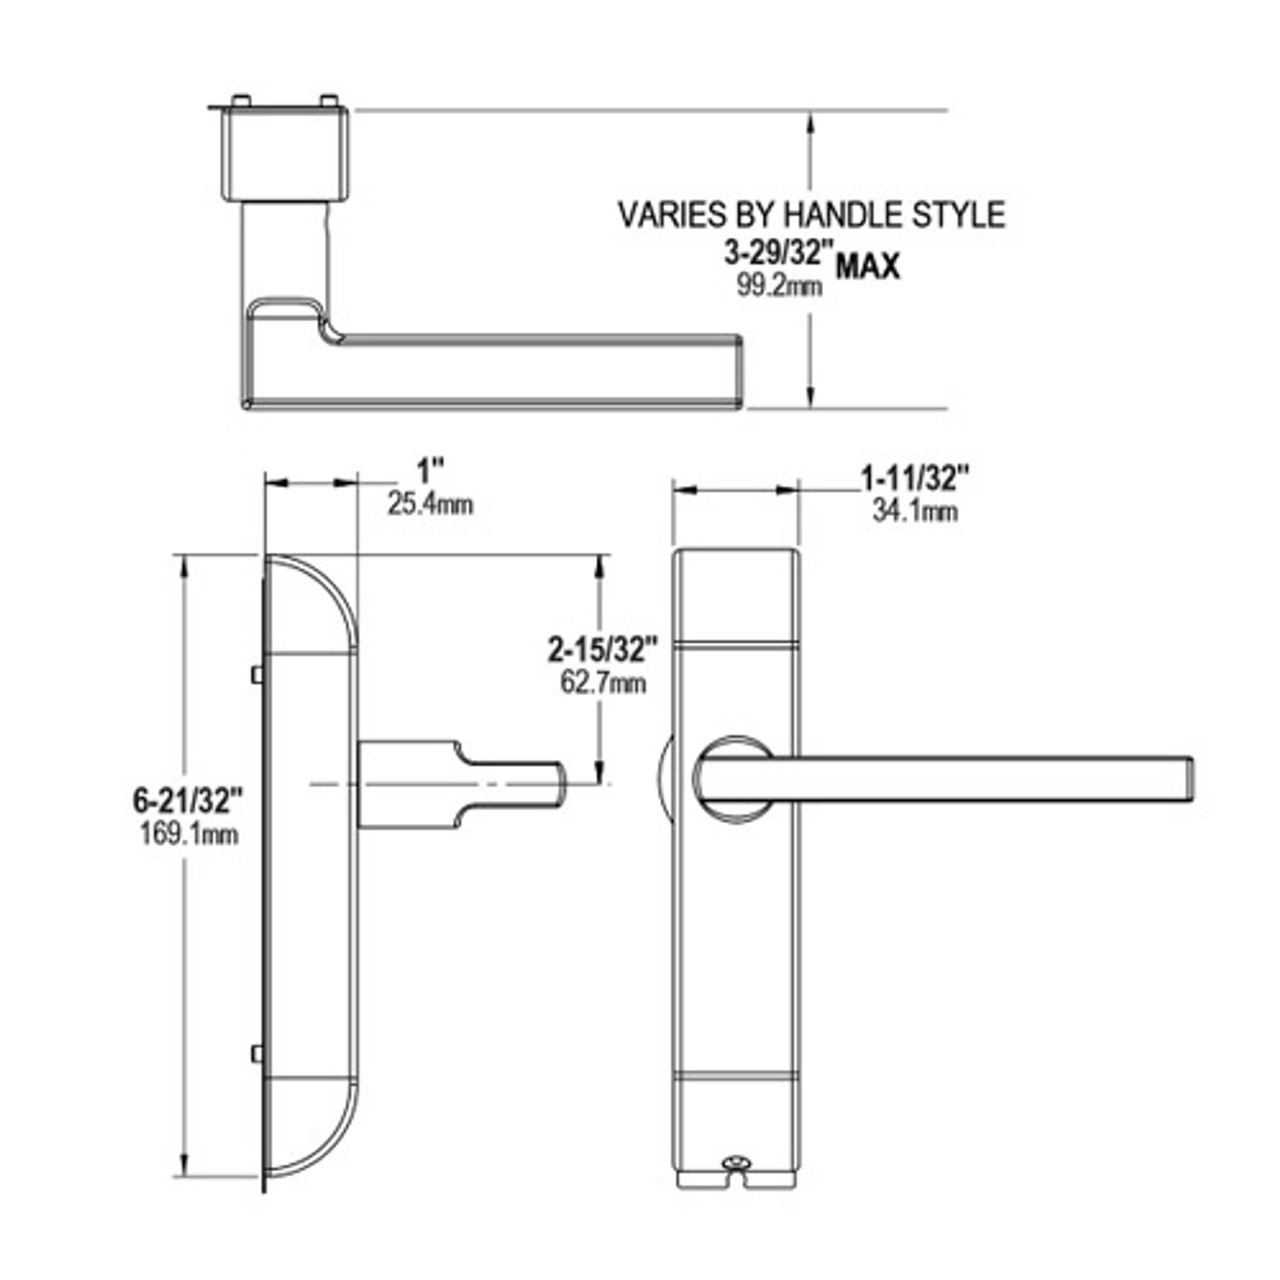 4600-MW-611-US32 Adams Rite MW Designer handle Dimensional View